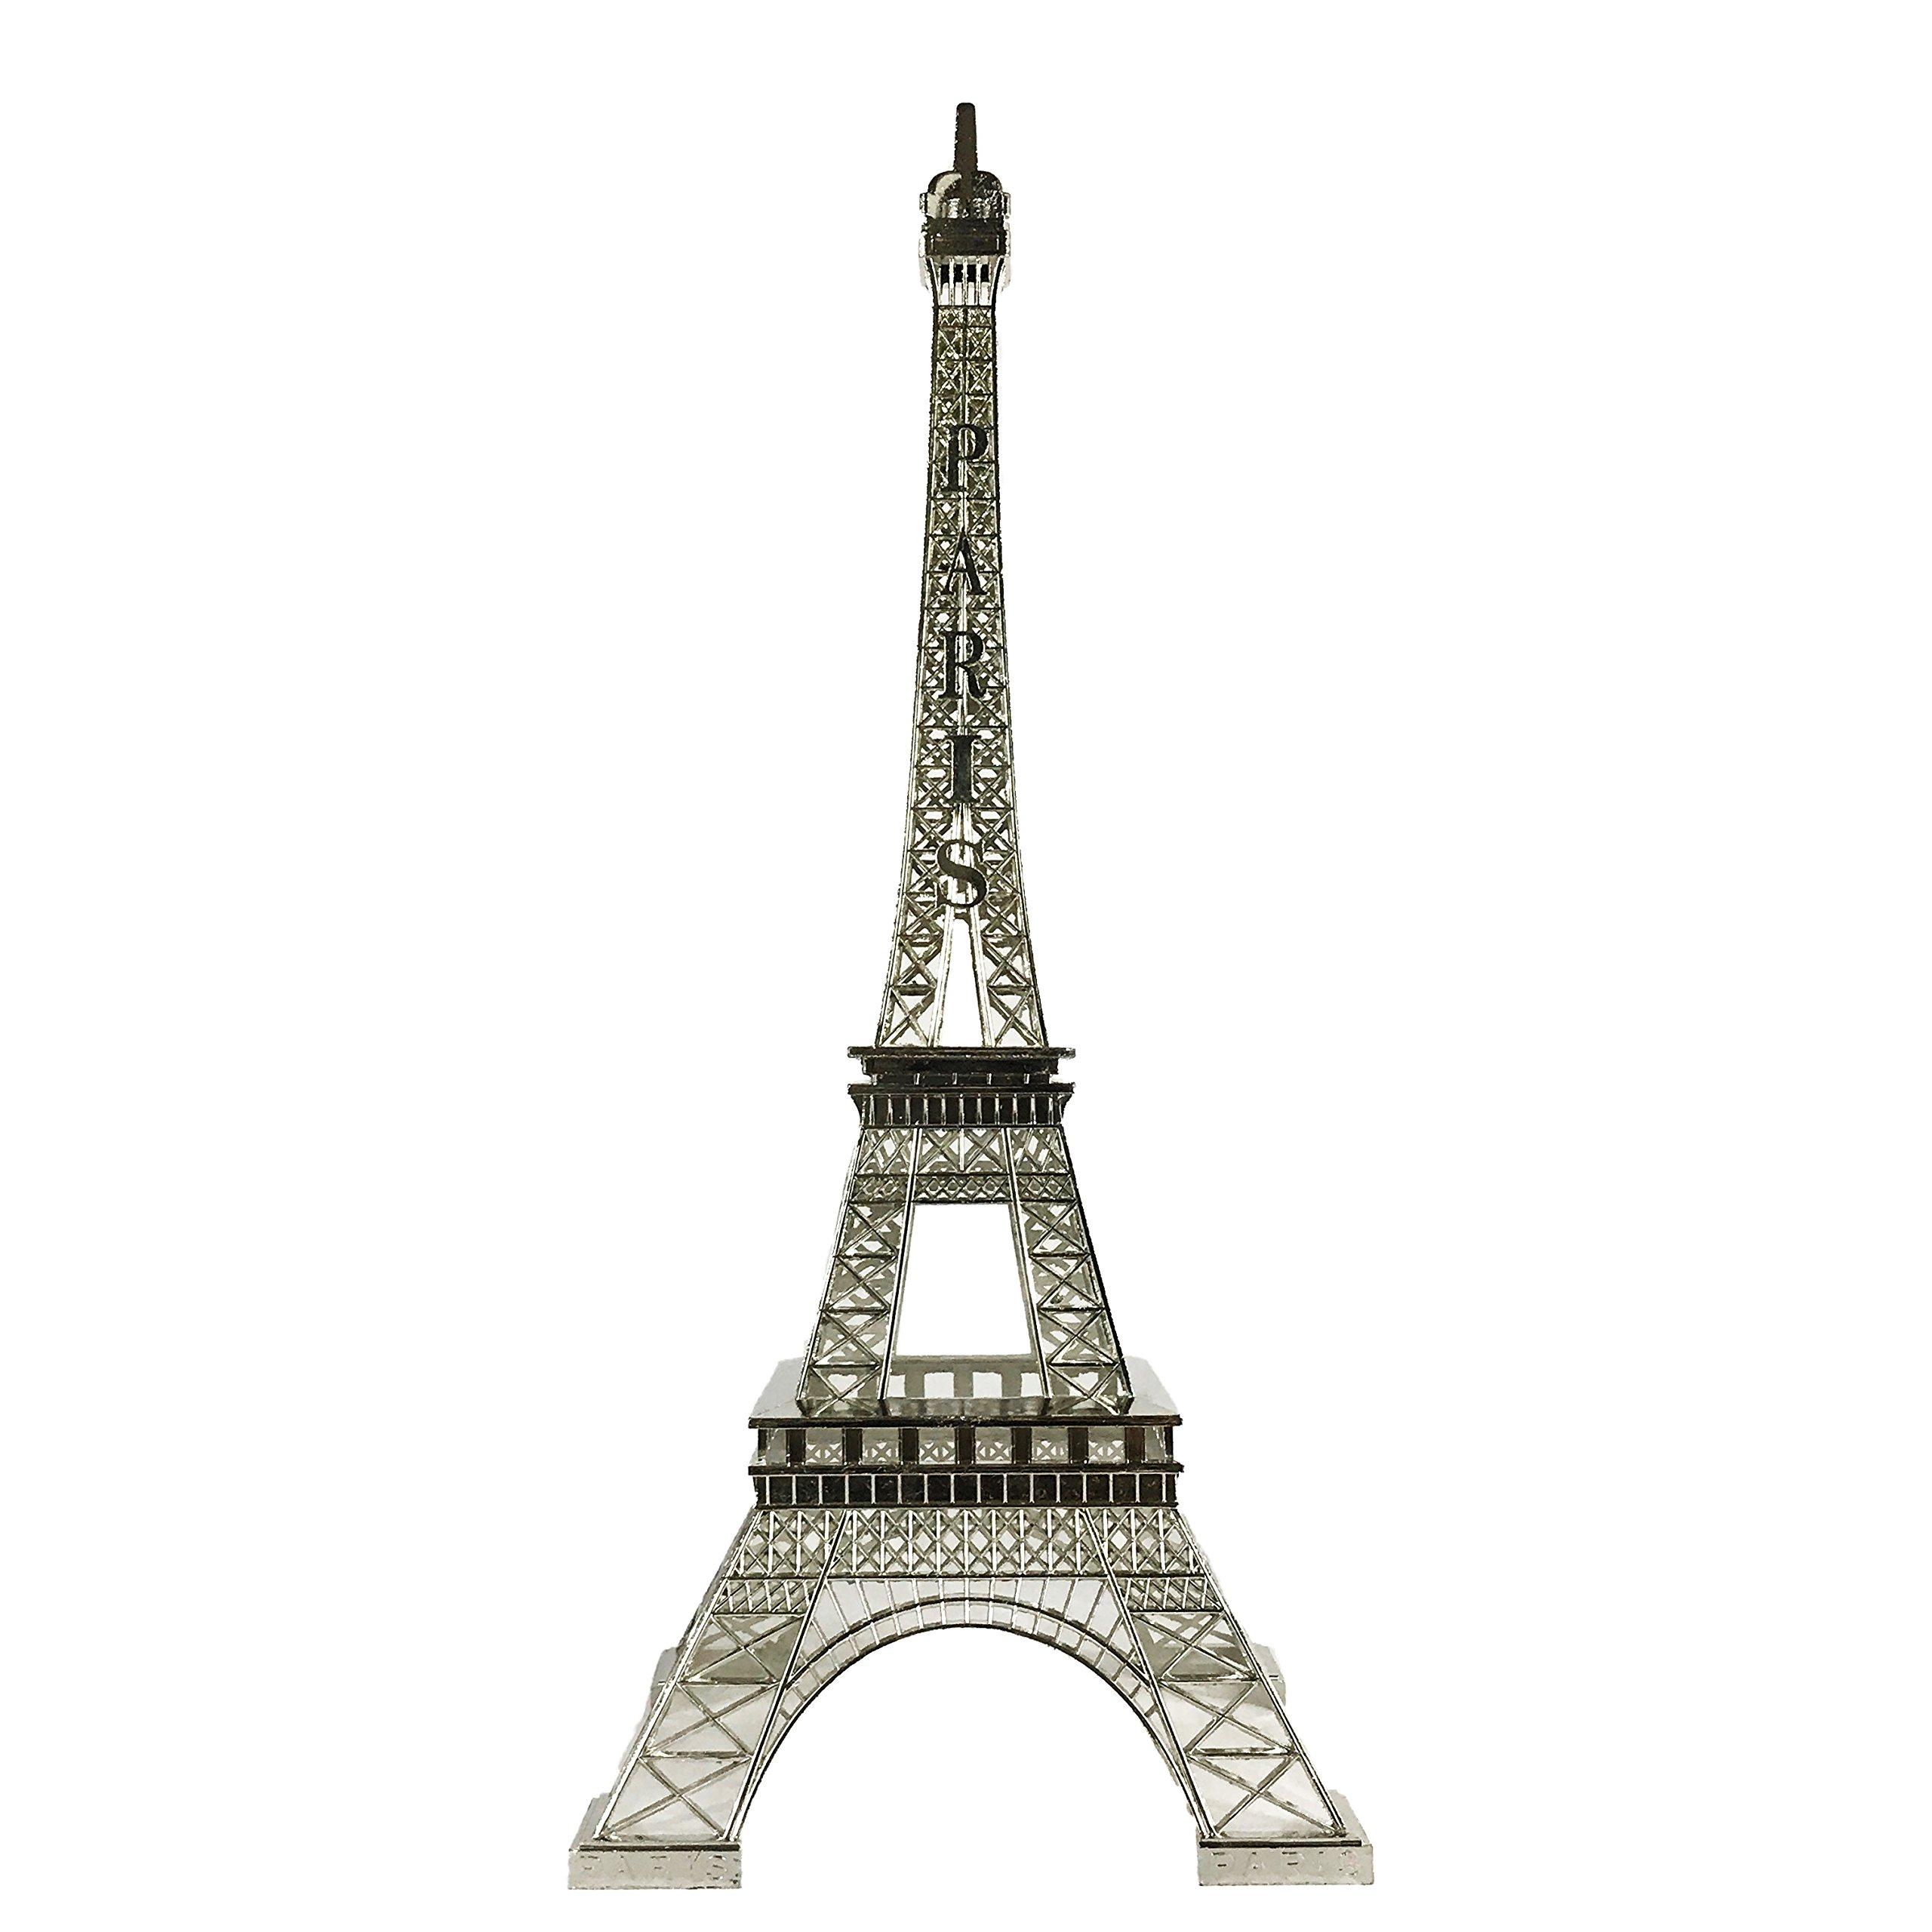 allgala 24'' Eiffel Tower Statue Decor Alloy Metal, Silver